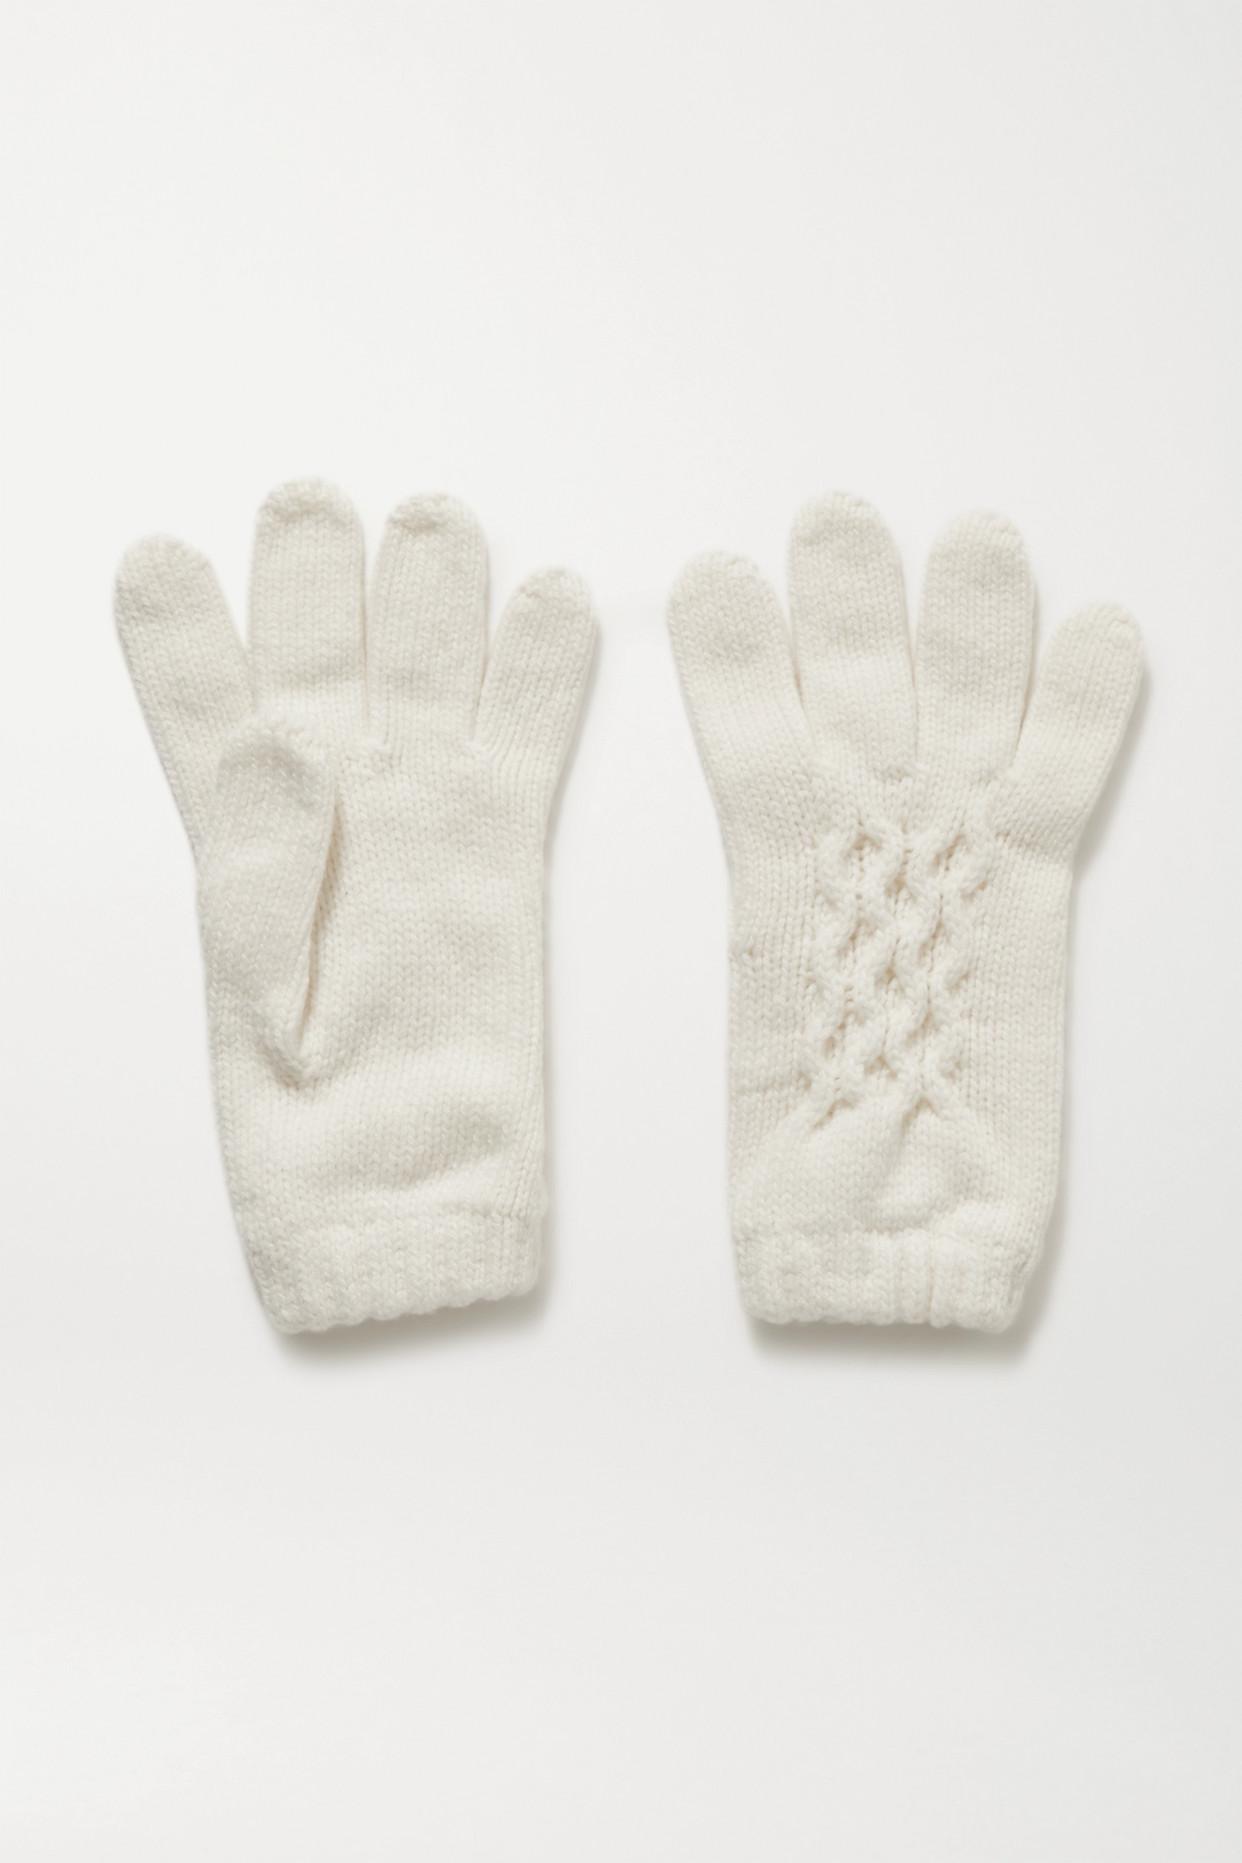 JOHNSTONS OF ELGIN - 【net Sustain】羊绒手套 - 象牙色 - One size